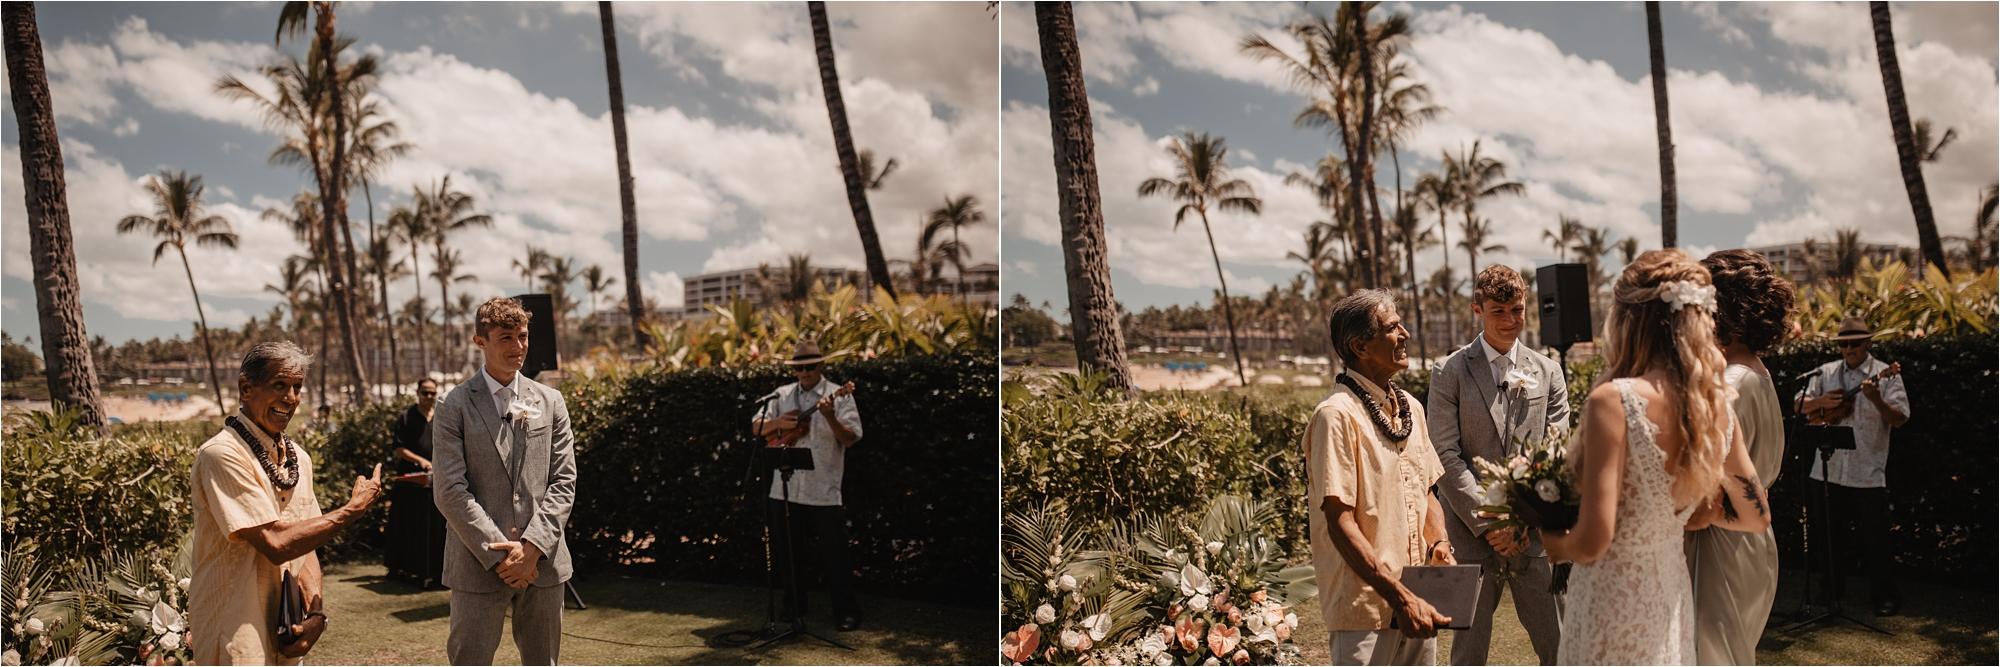 maui-hawaii-intimate-tropical-wedding_0028.jpg